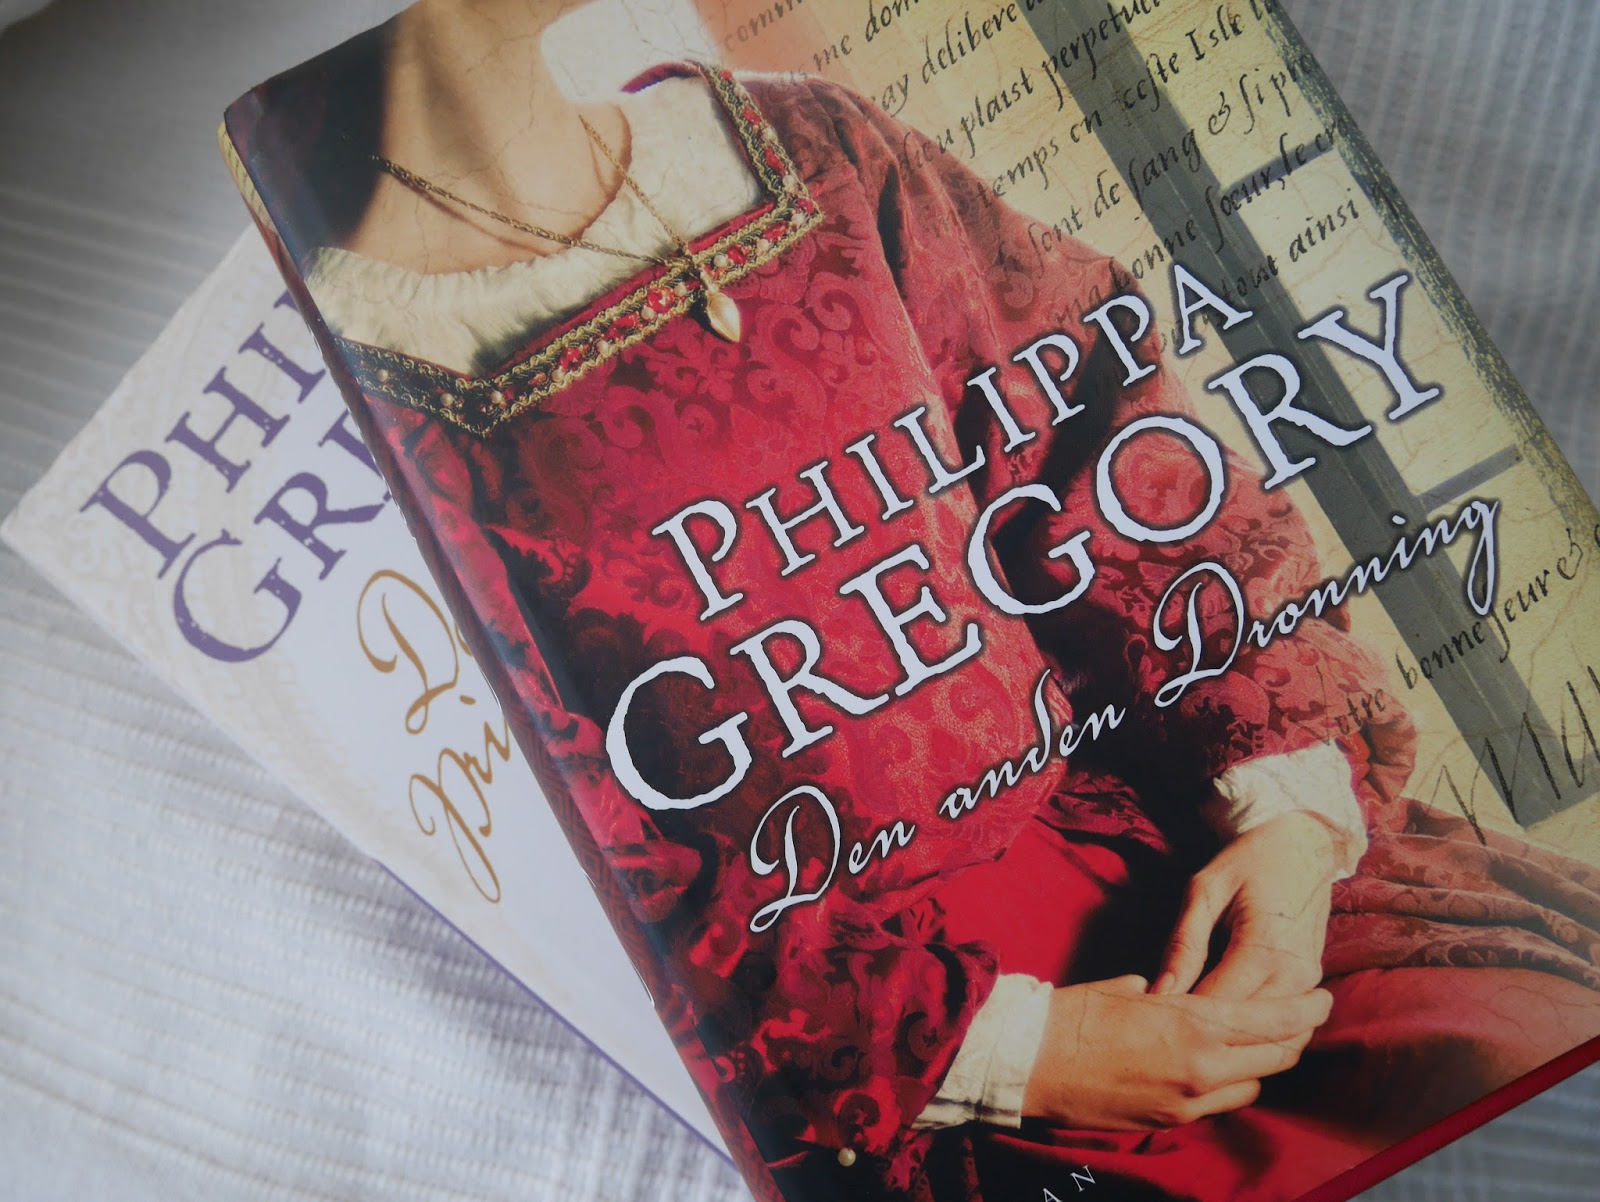 philippa gregory rækkefølge